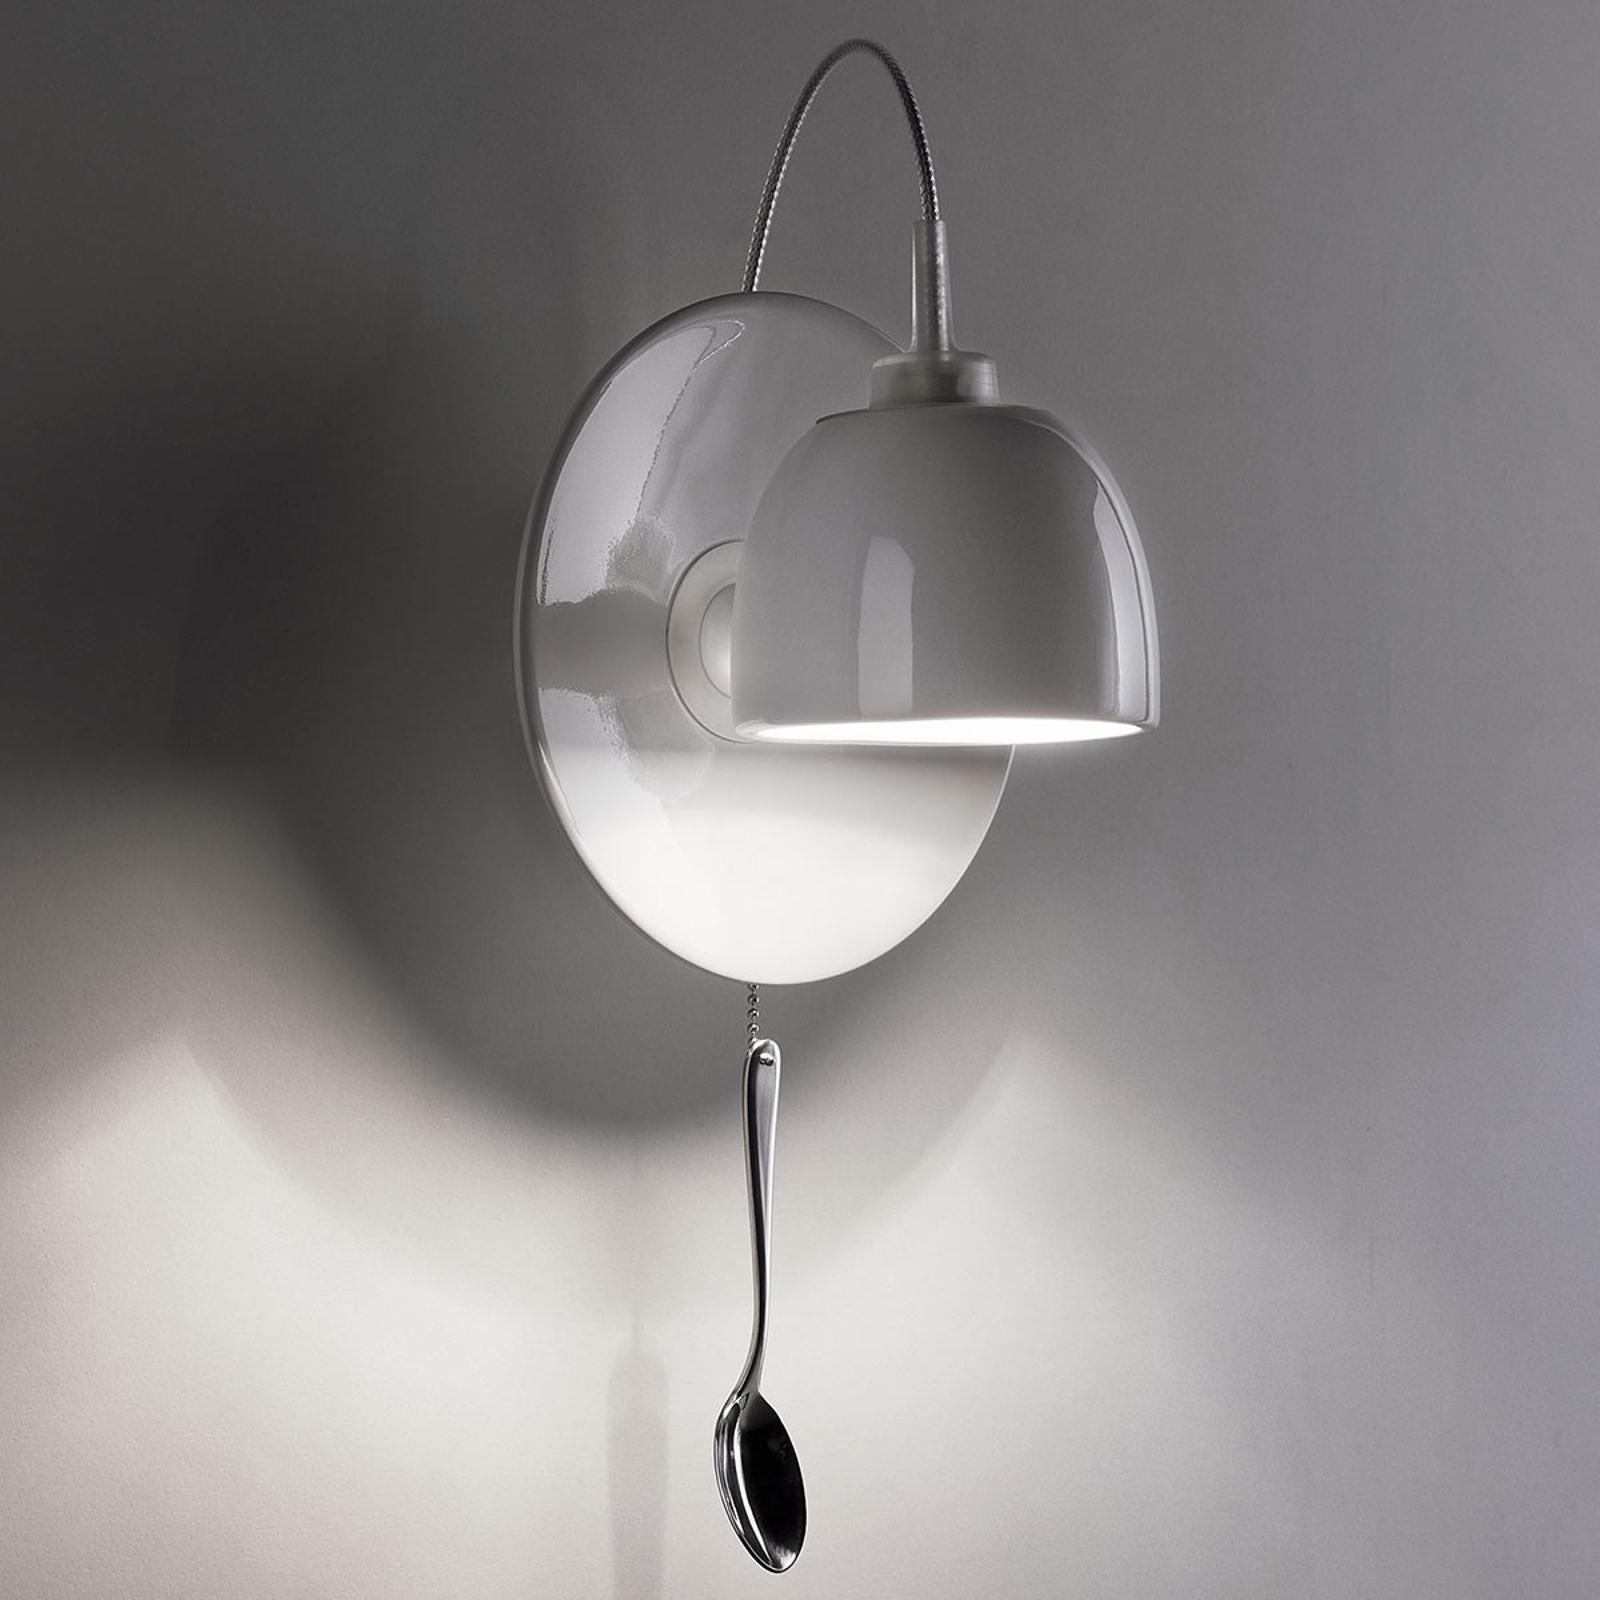 Ingo Maurer Light au Lait - Wandleuchte